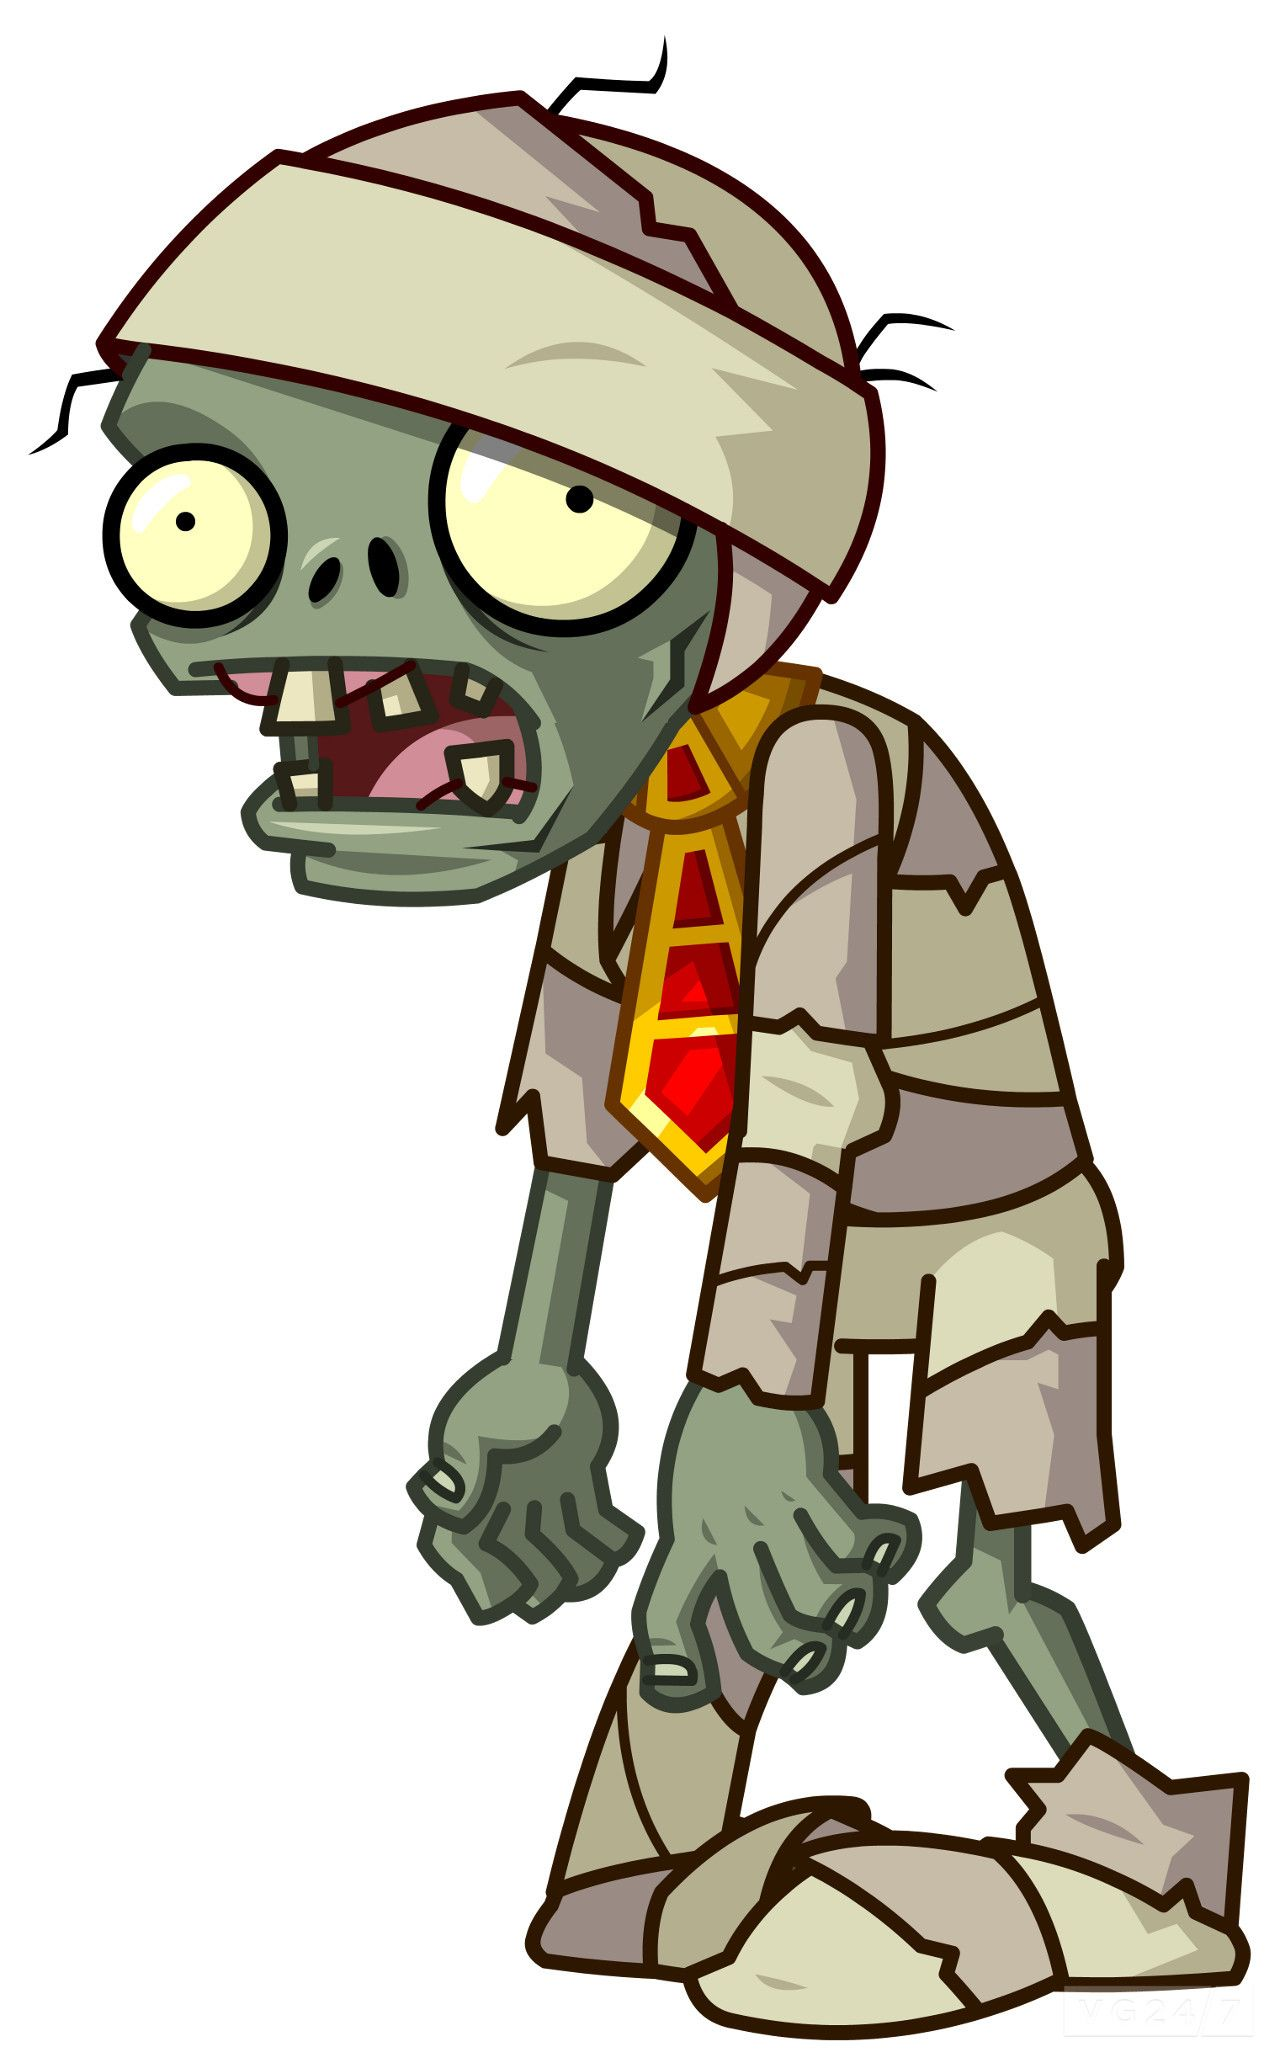 Zombie Cartoon Images : zombie, cartoon, images, Elementary, Educator, Asks:, Merit, Zombies?, Zombie, Cartoon,, Plant, Zombie,, Drawings